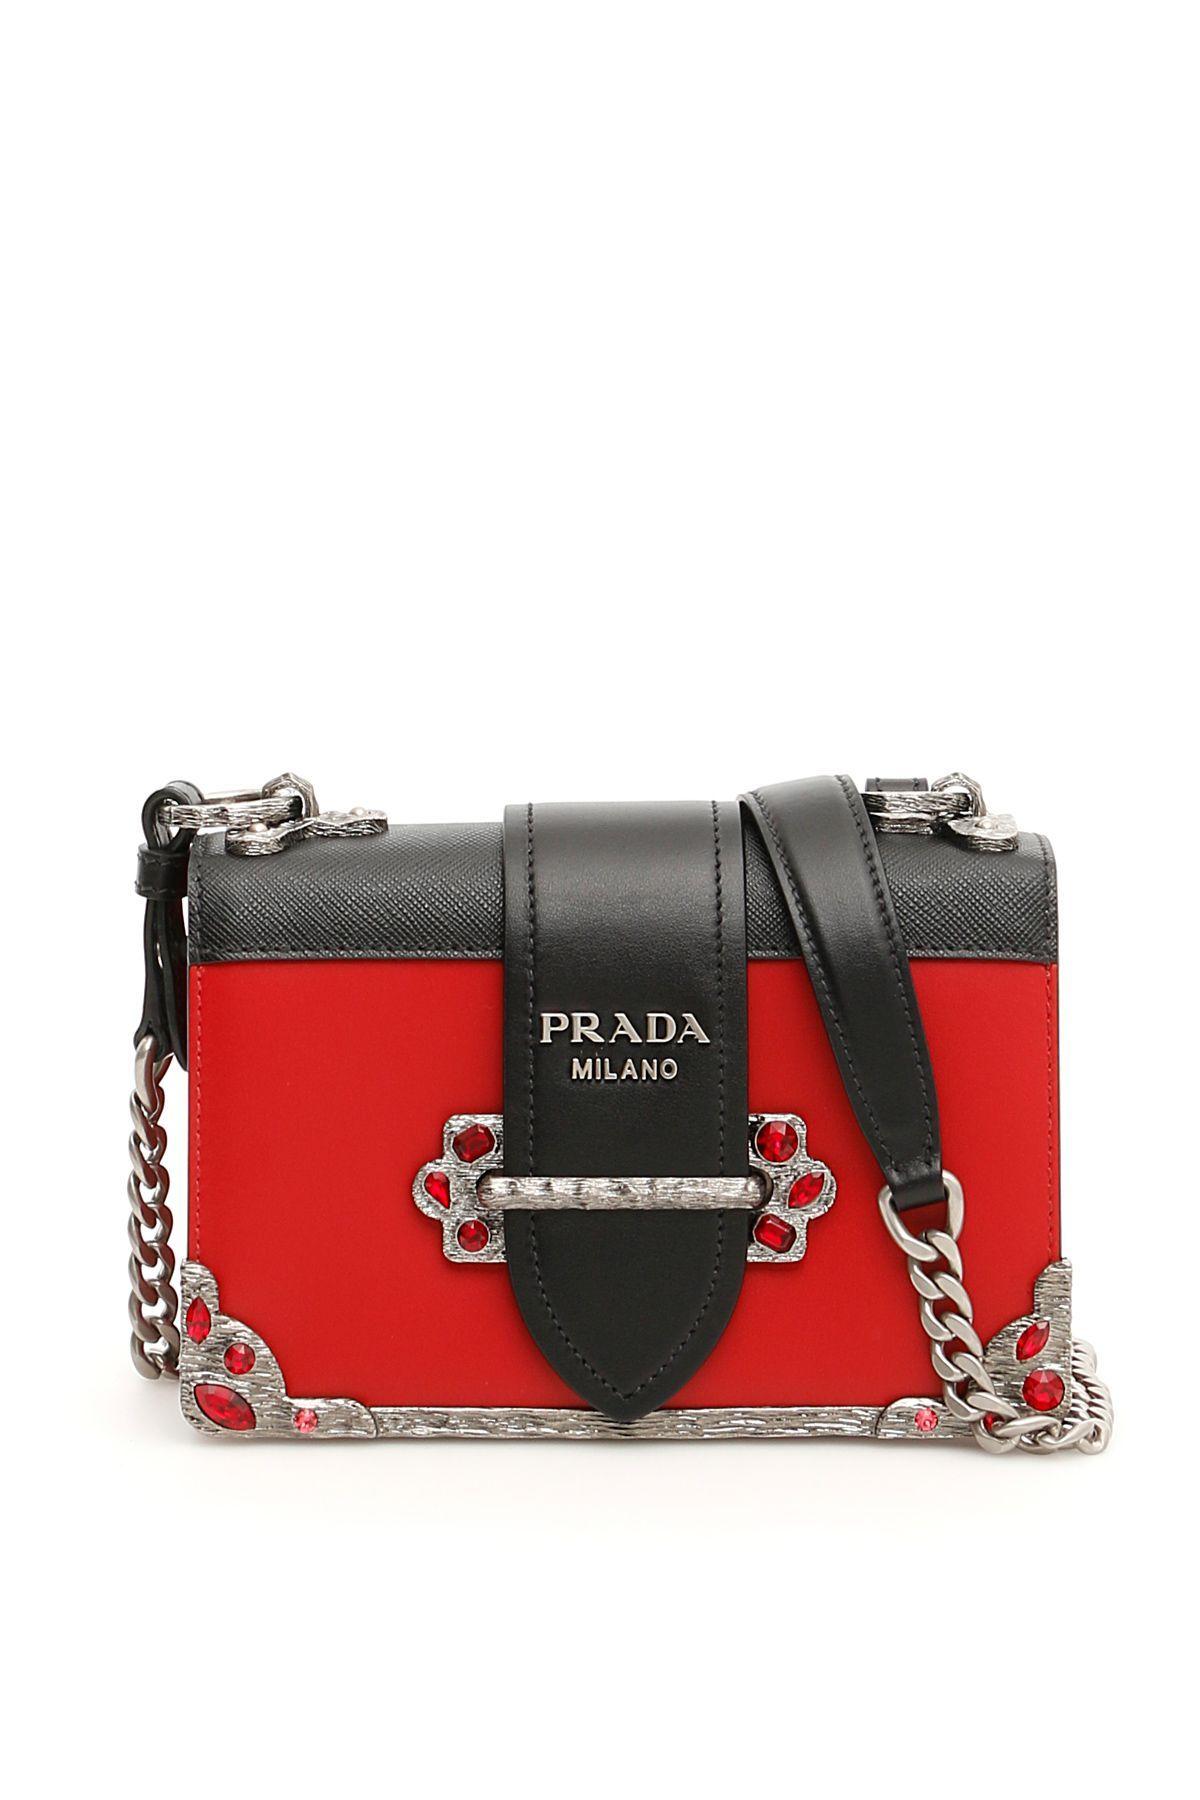 Prada Cahier Jewel Bag In Fuoco Nero ModeSens Jeweled